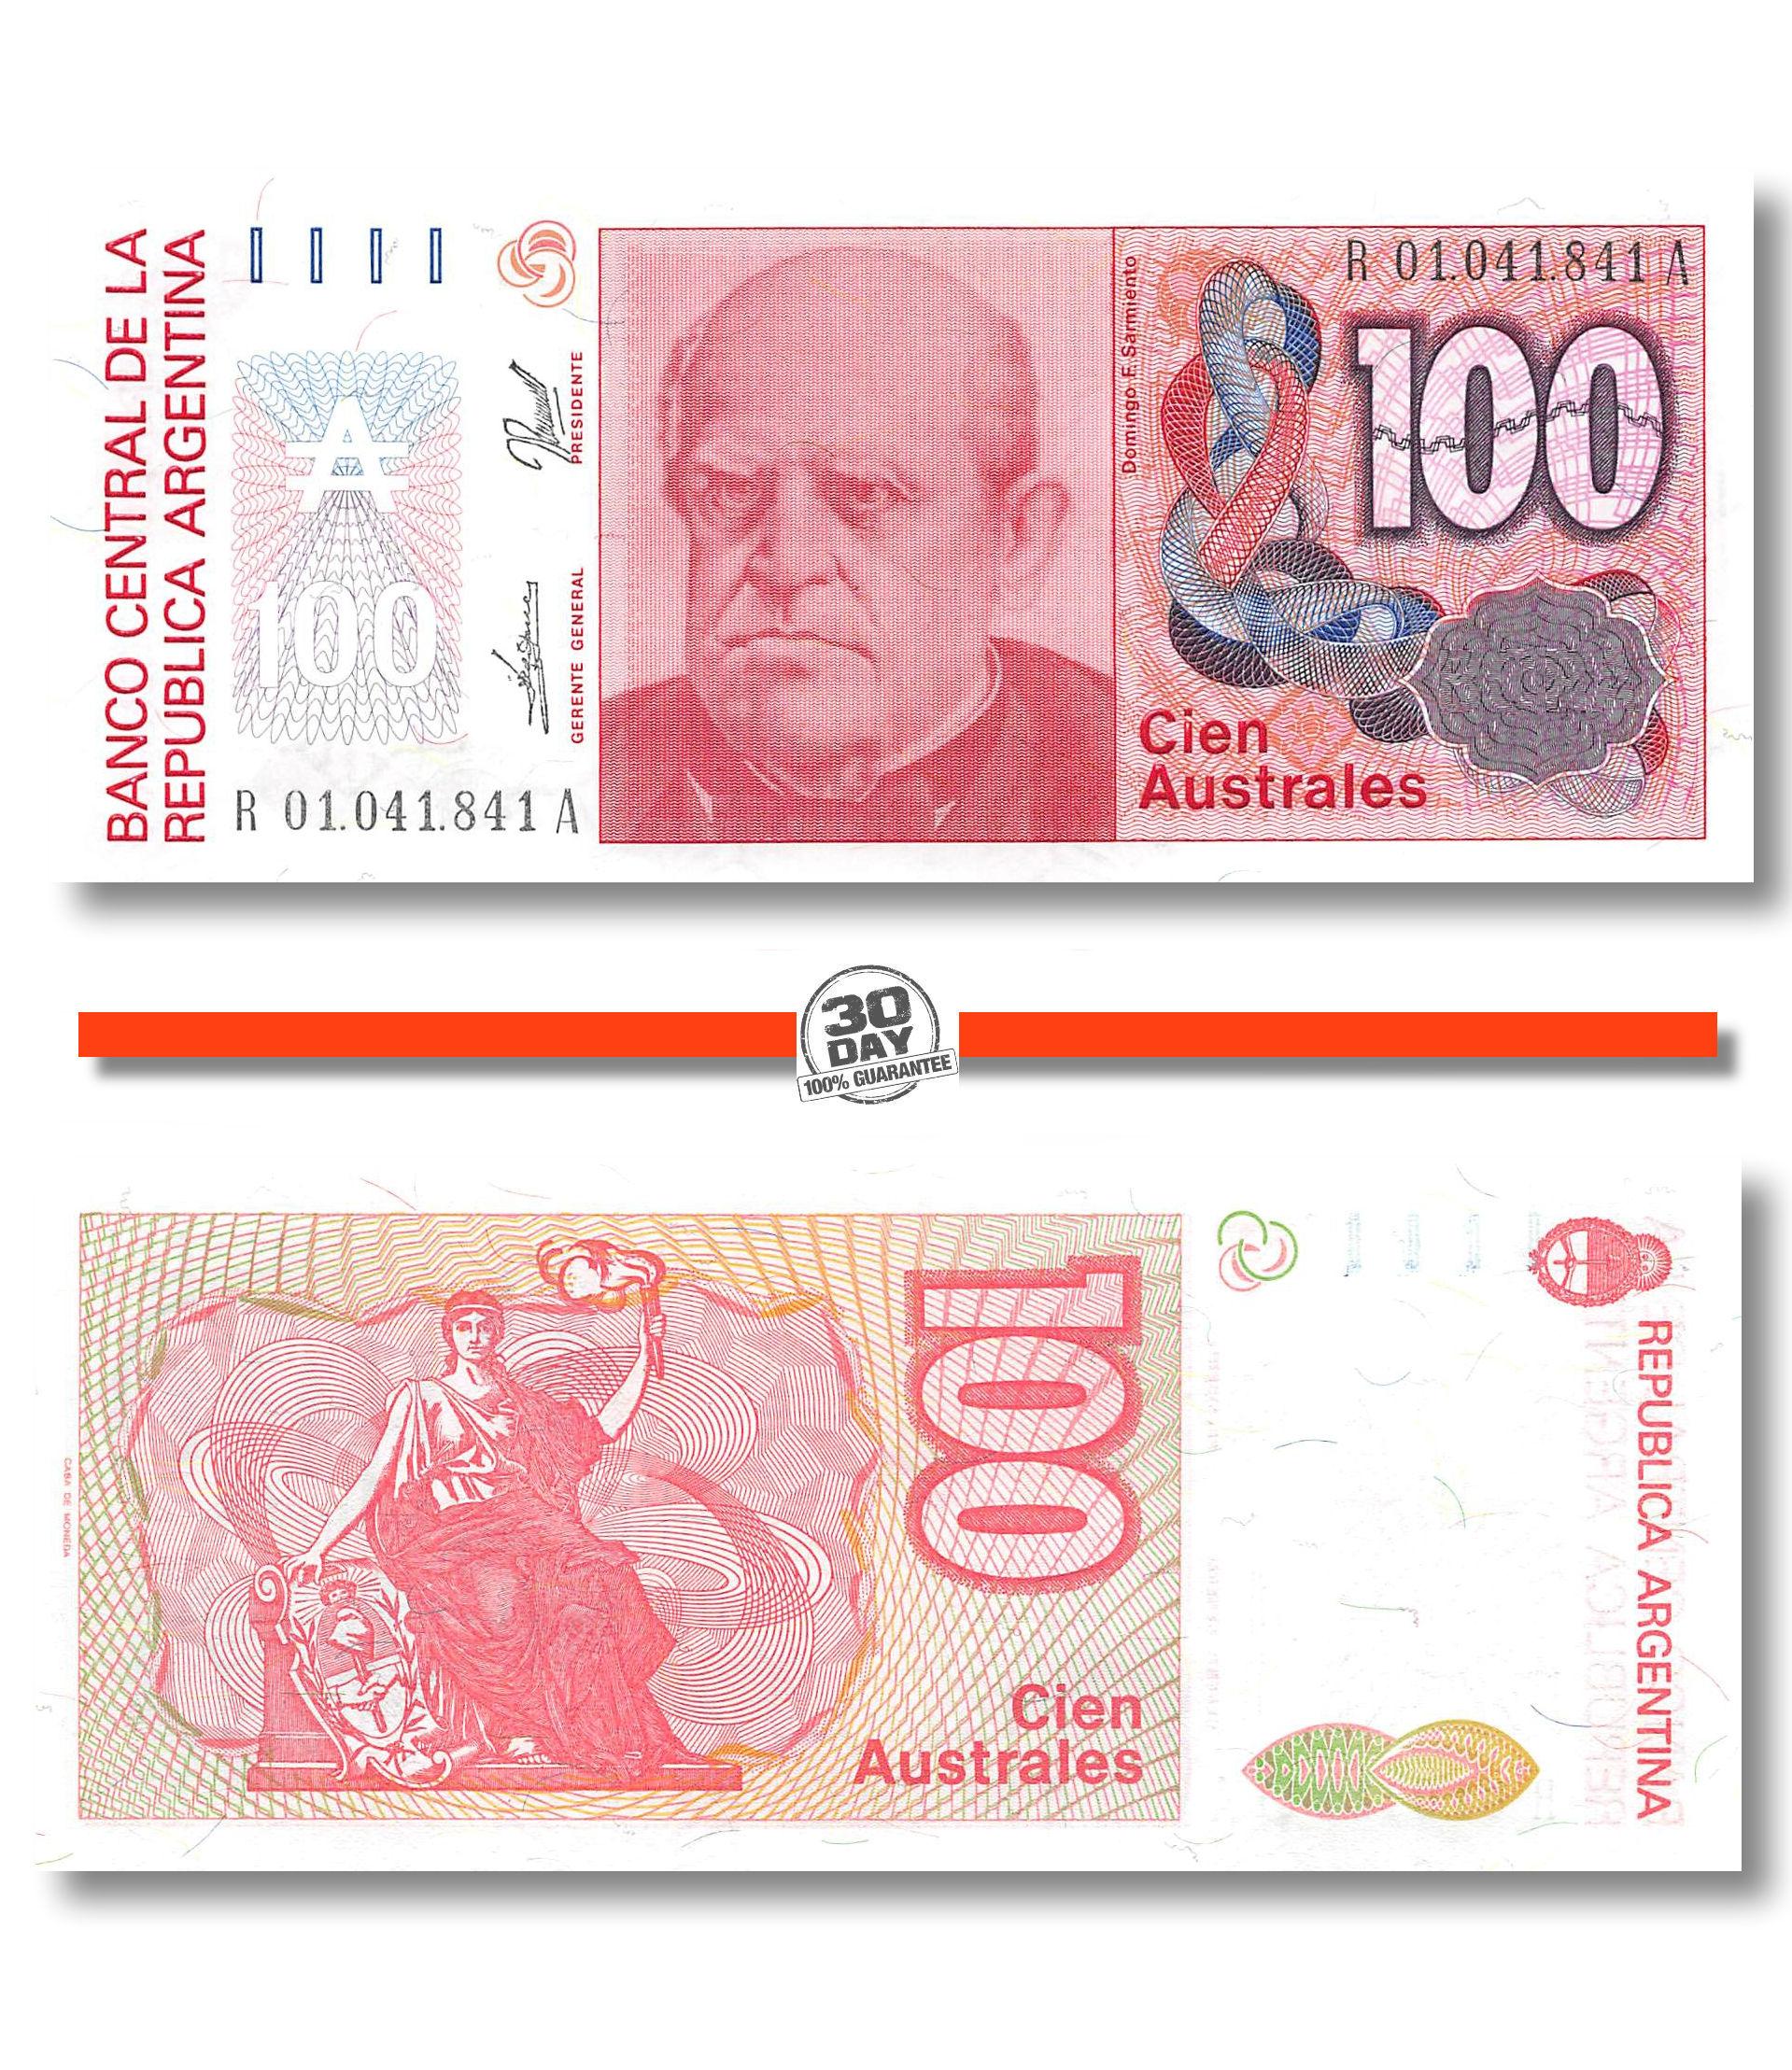 ARGENTINA BANKNOTE 100 AUSTRALES UNC